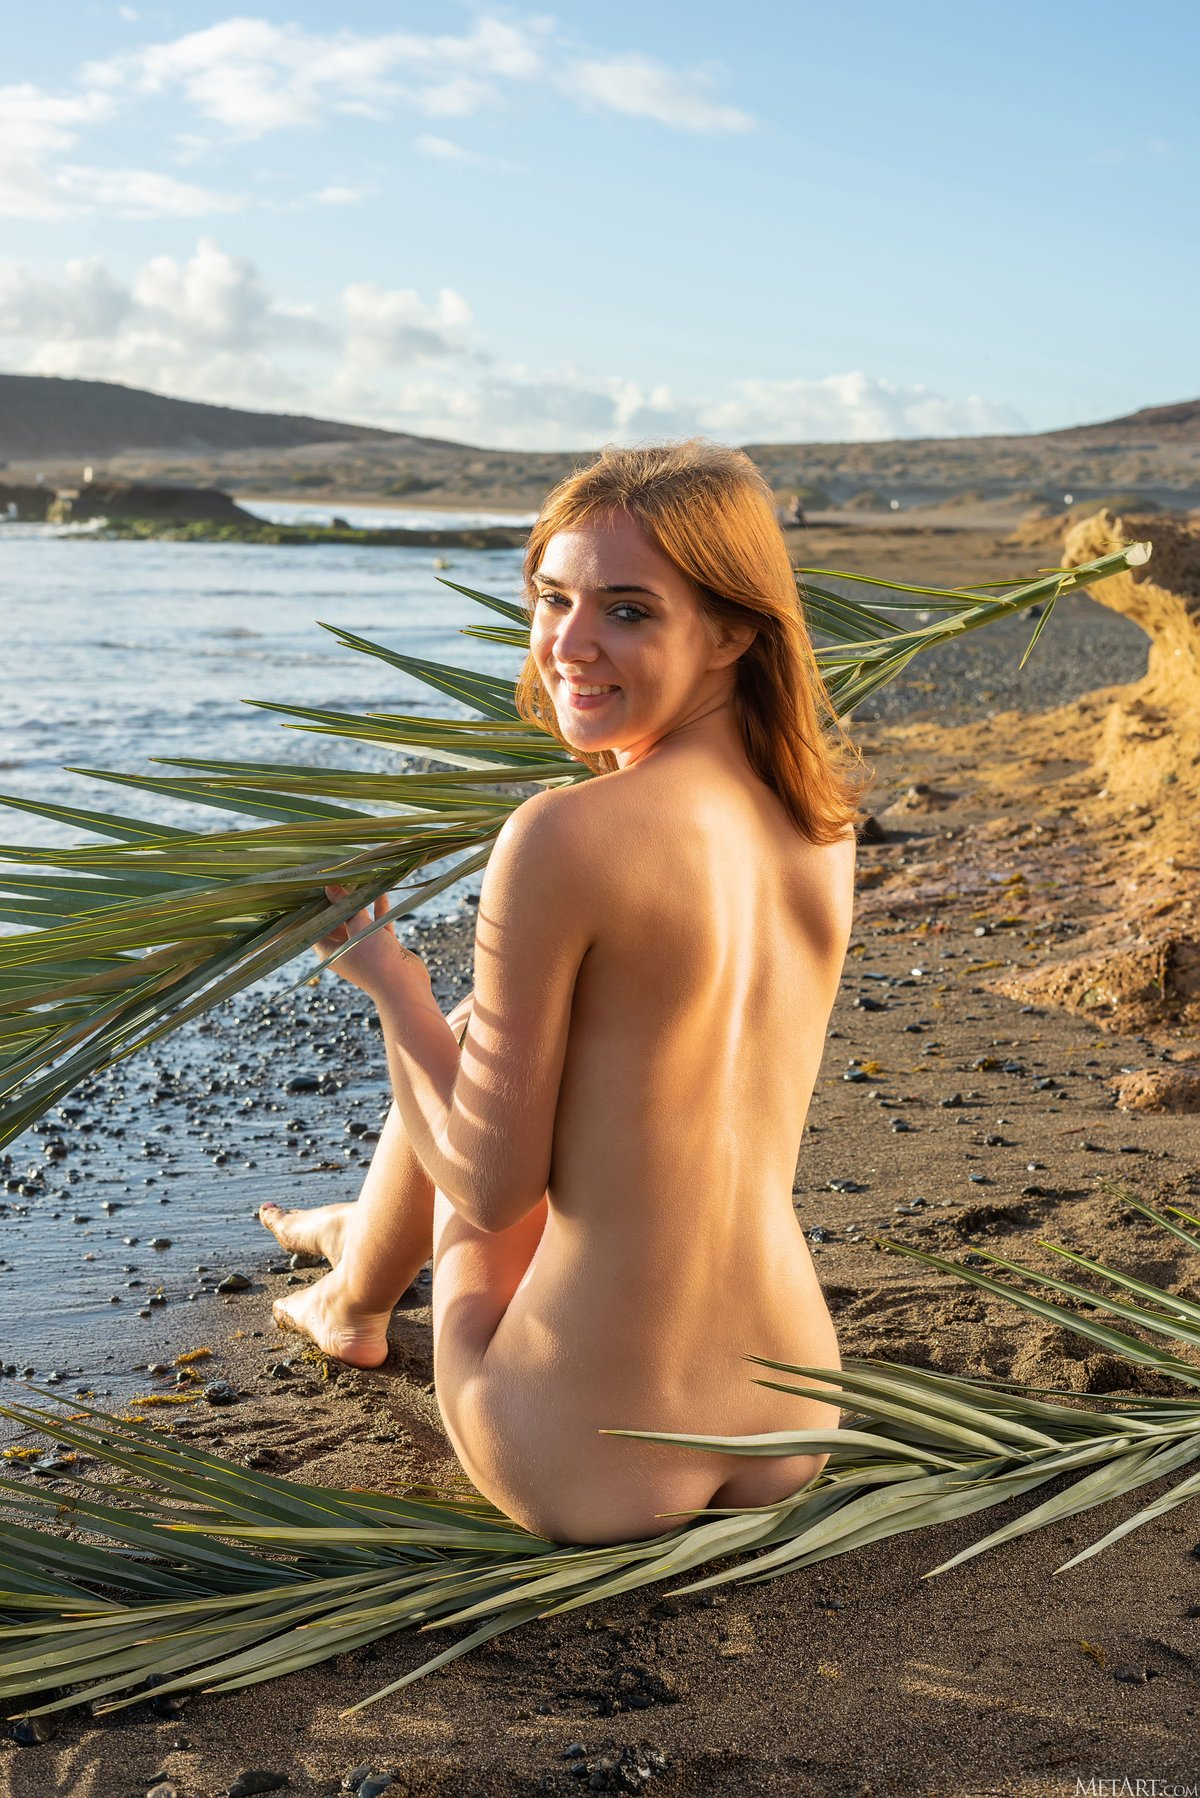 Молодая шатенка развлекается на пляже